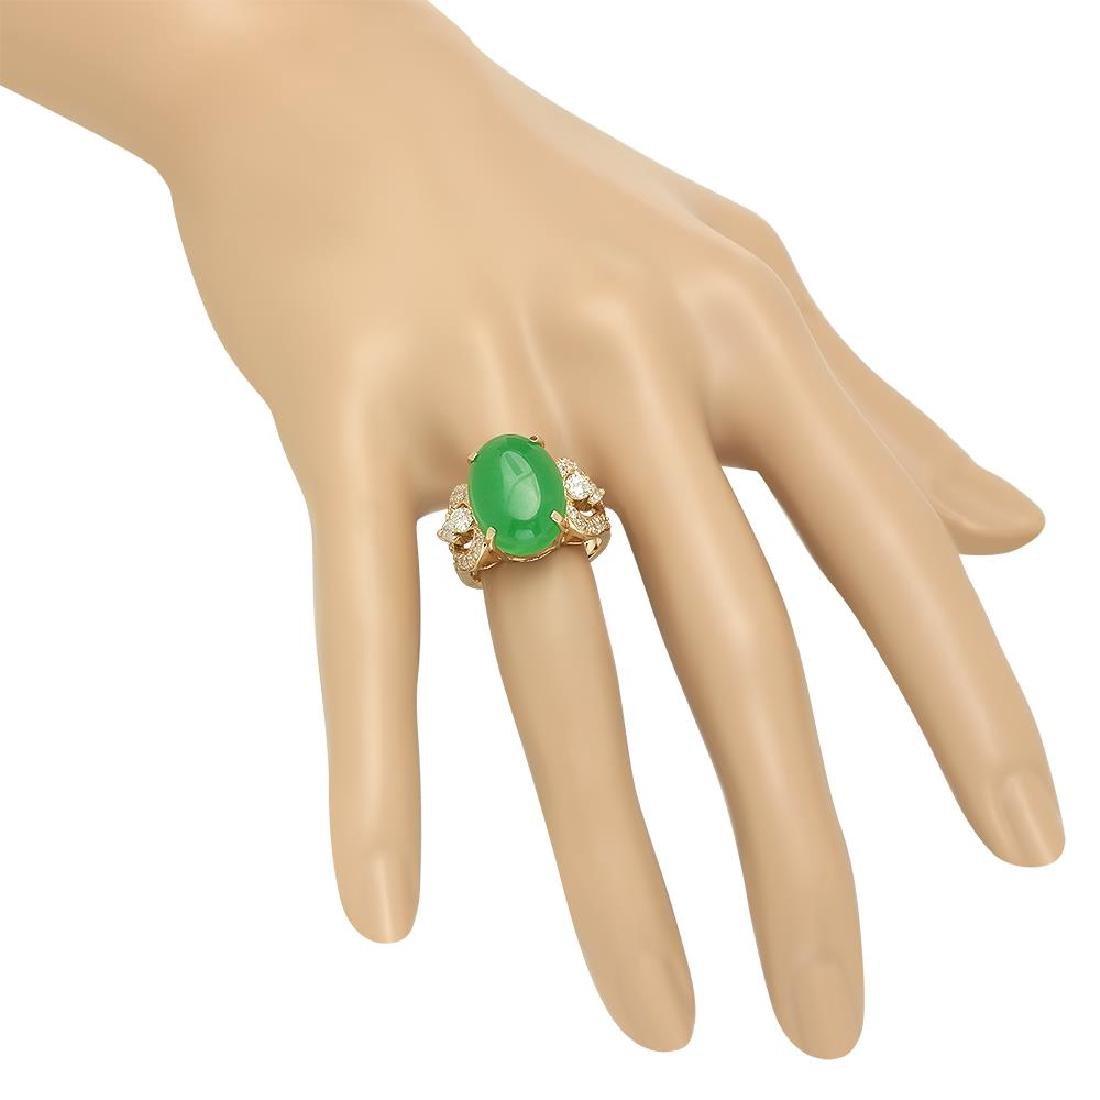 14K Gold 9.38ct Jadeite 1.25cts Diamond Ring - 3